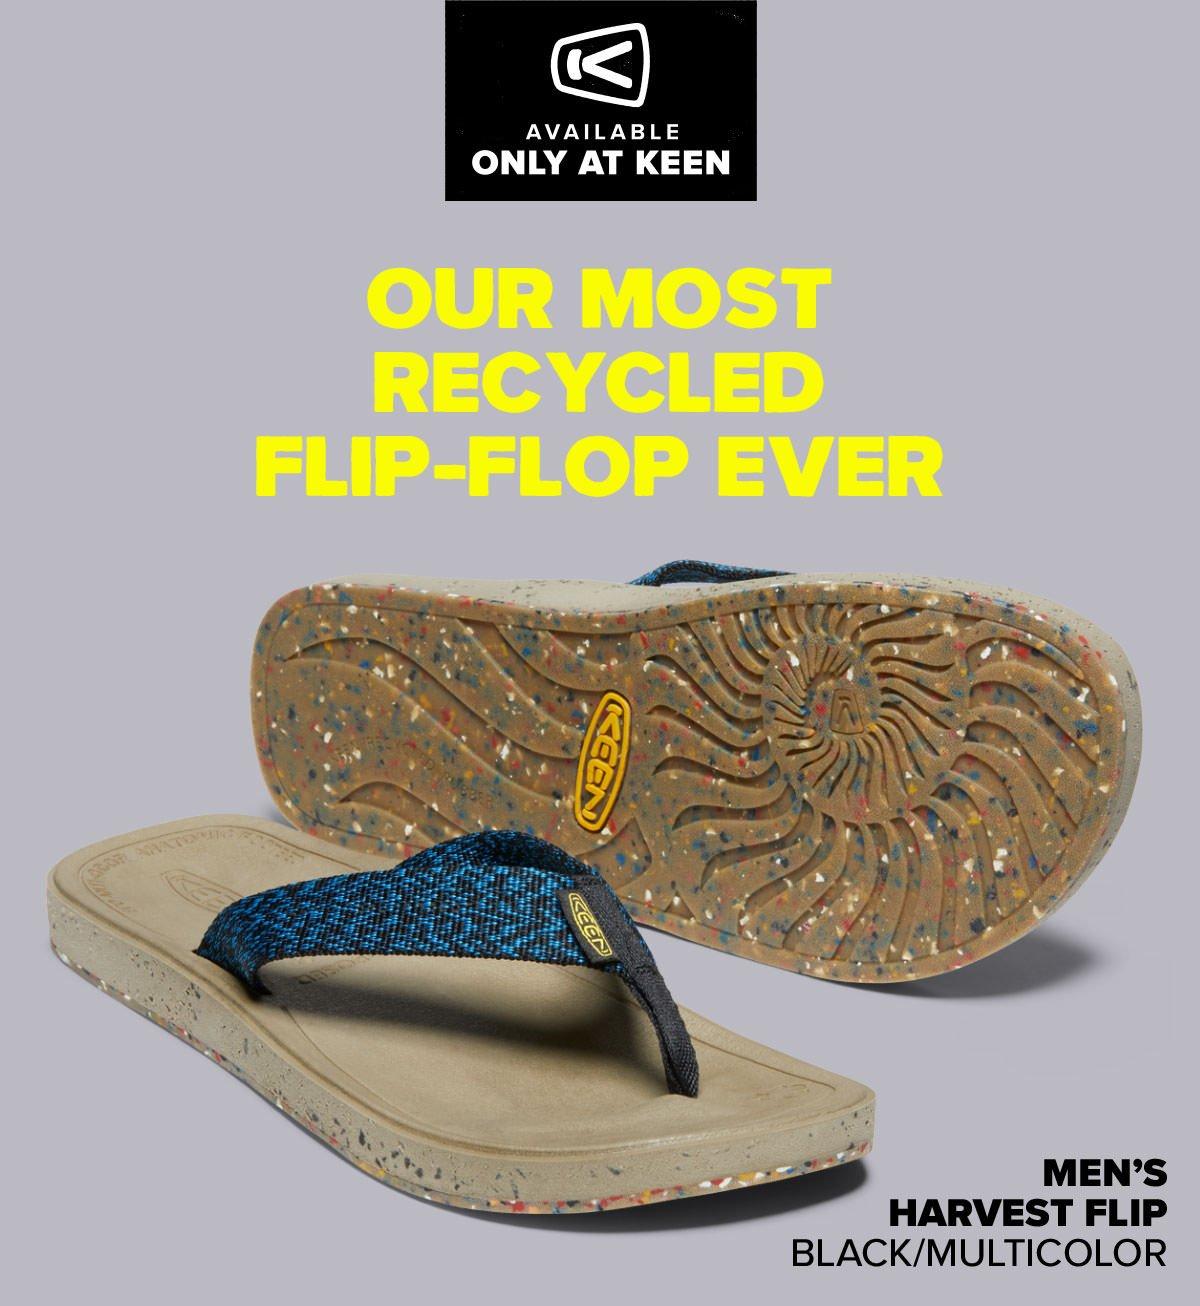 feel-good, made-good flip-flop   Milled